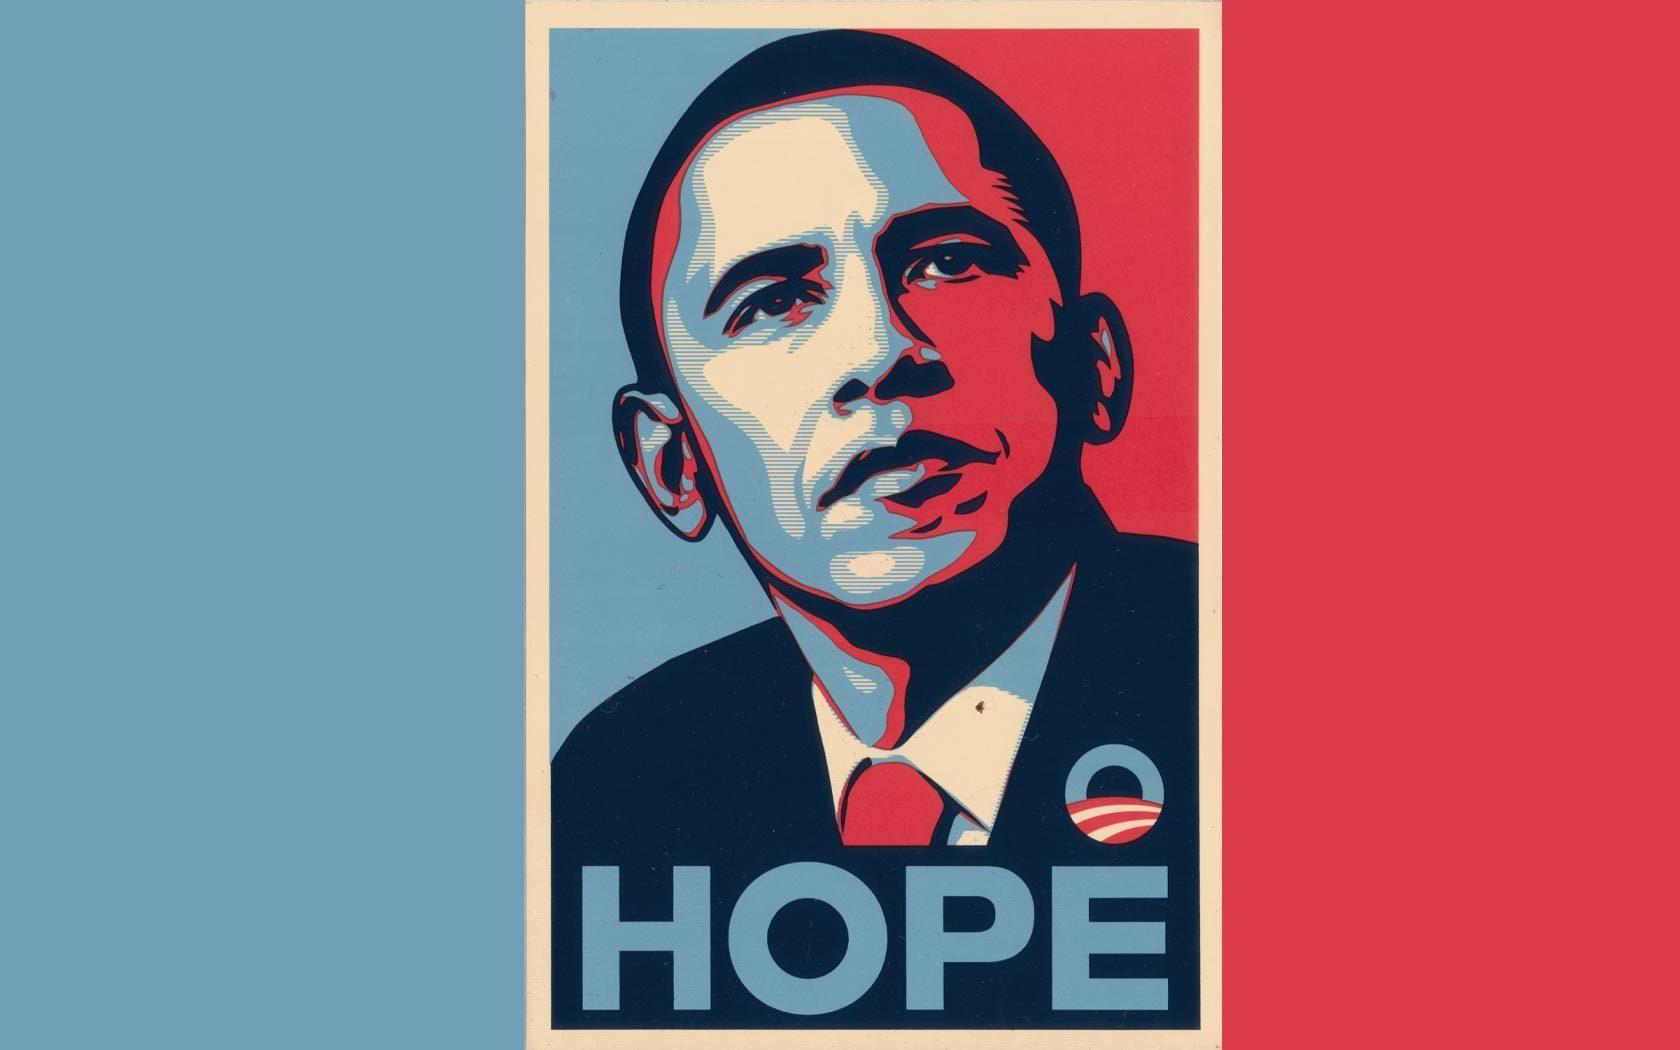 Barack Obama Wallpaper High Definition 2014 1680x1050